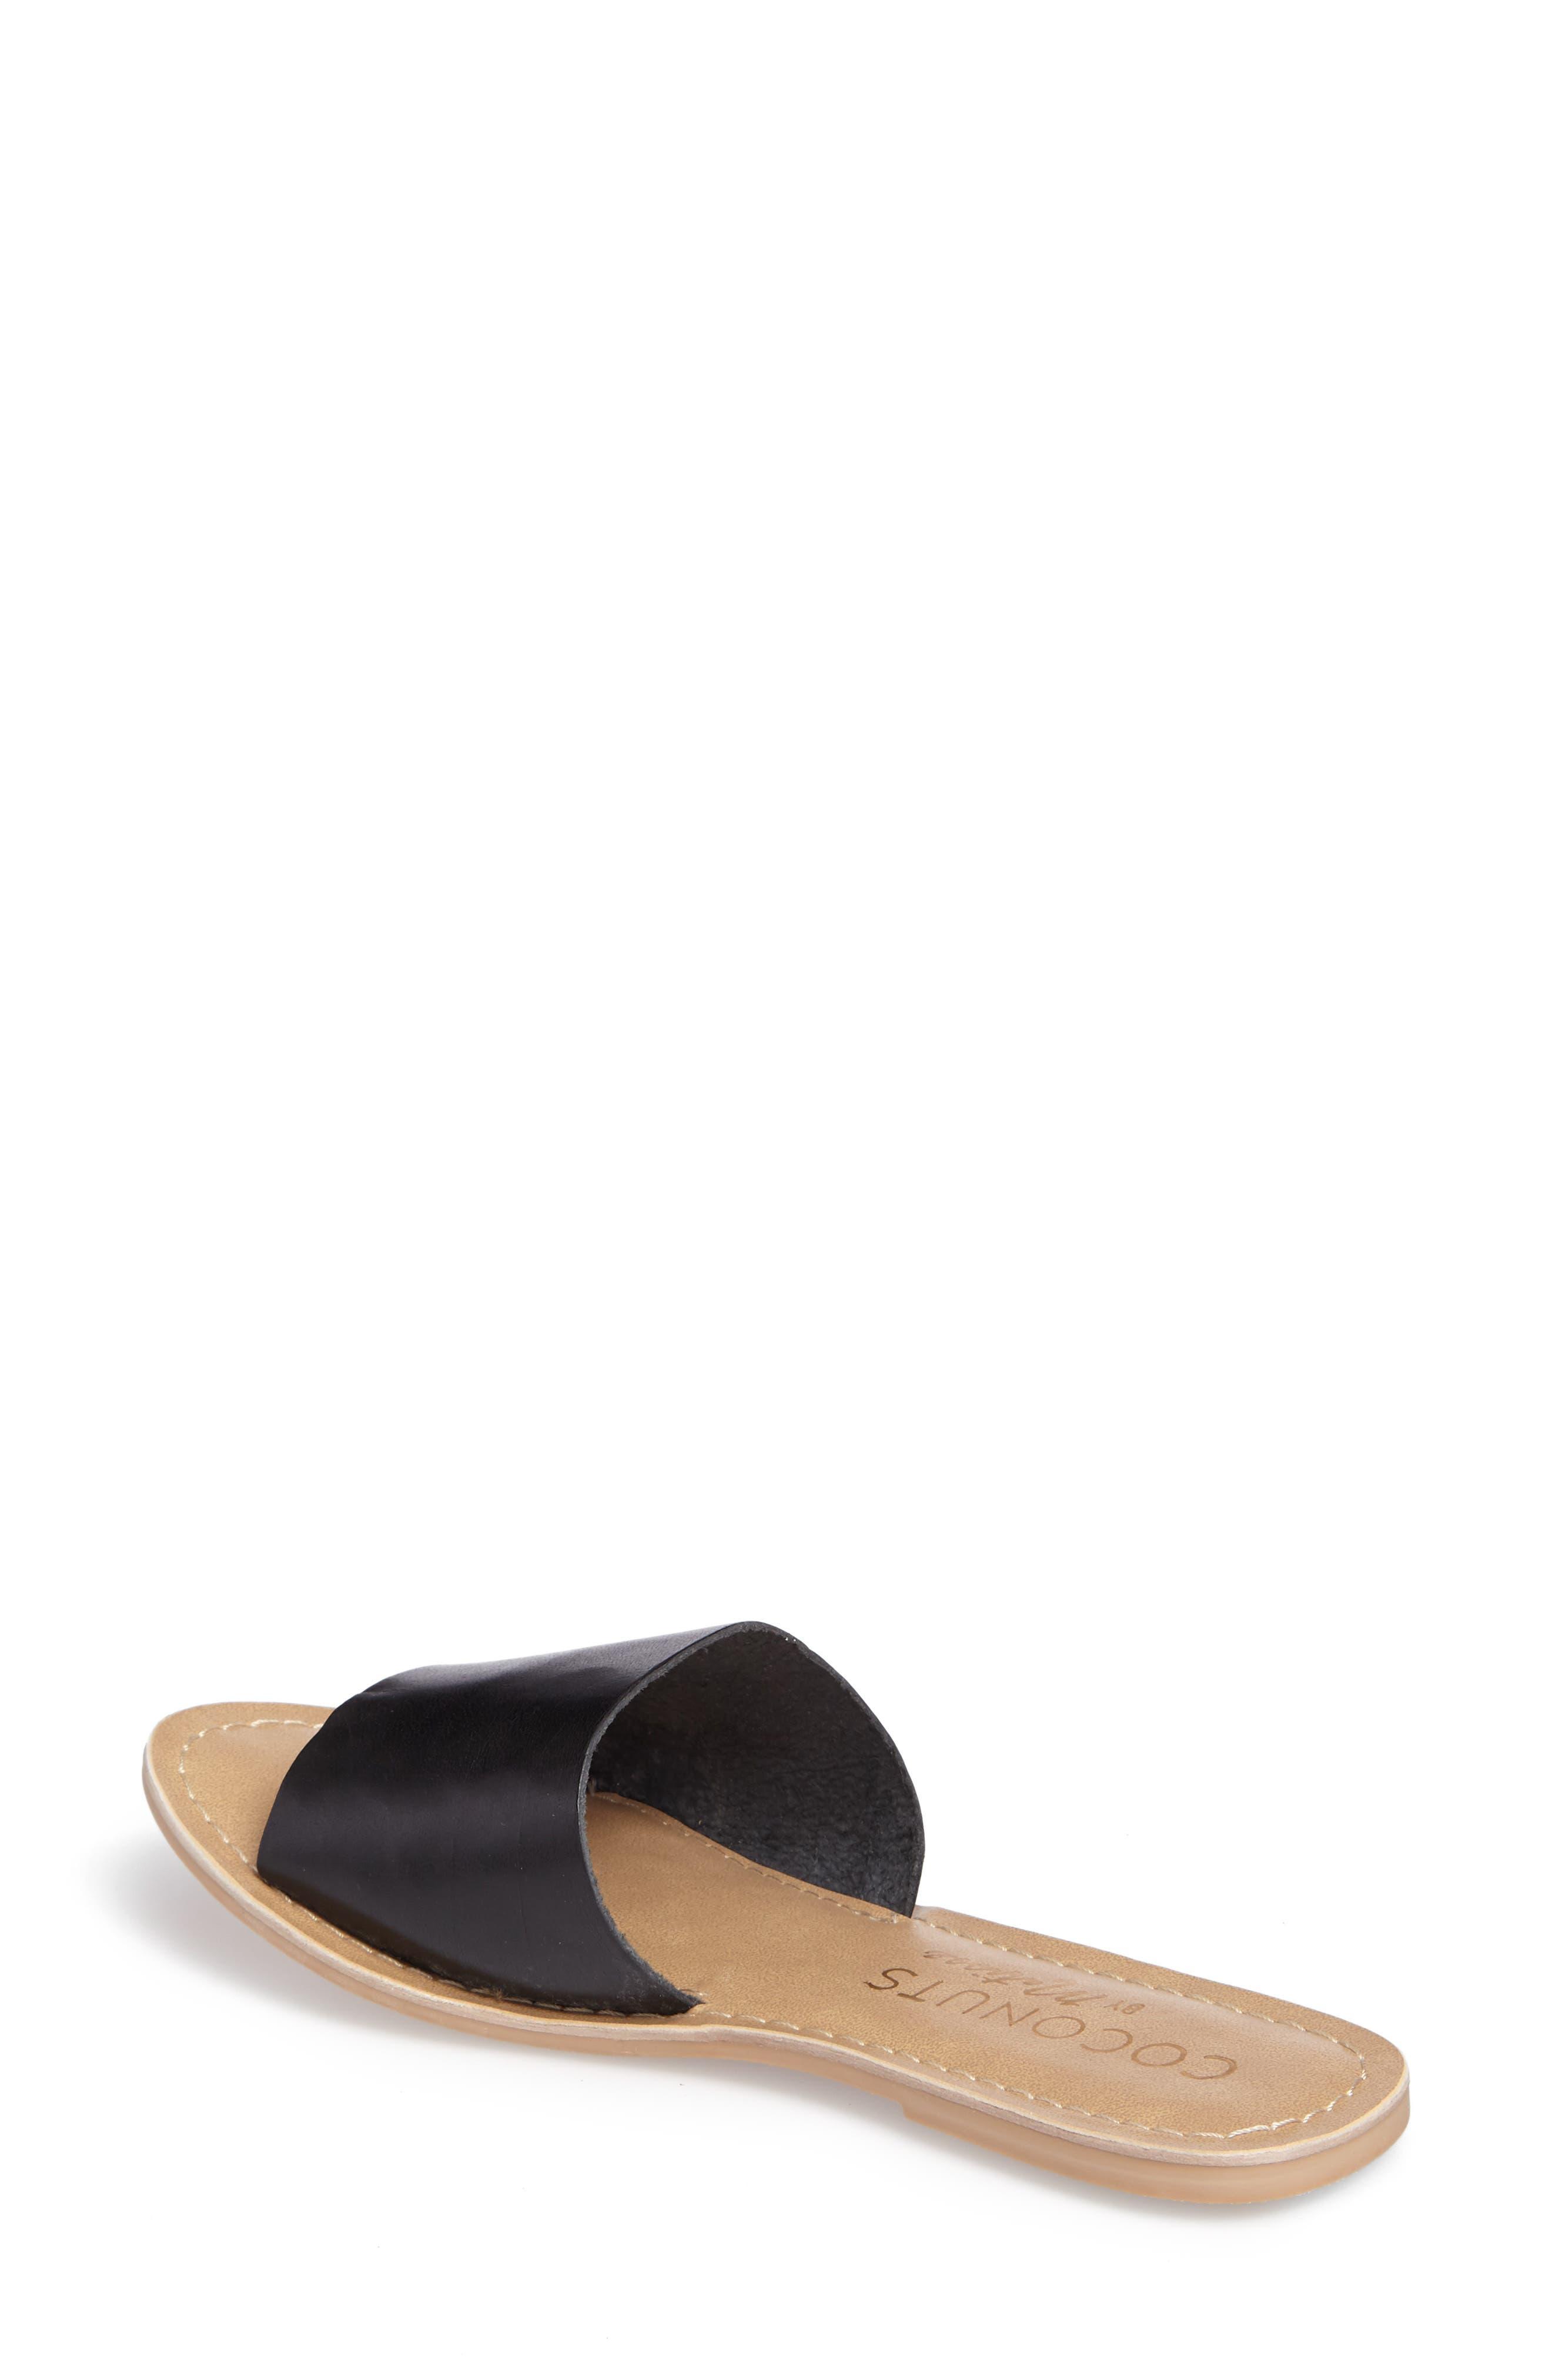 Cabana Slide Sandal,                             Alternate thumbnail 2, color,                             BLACK LEATHER